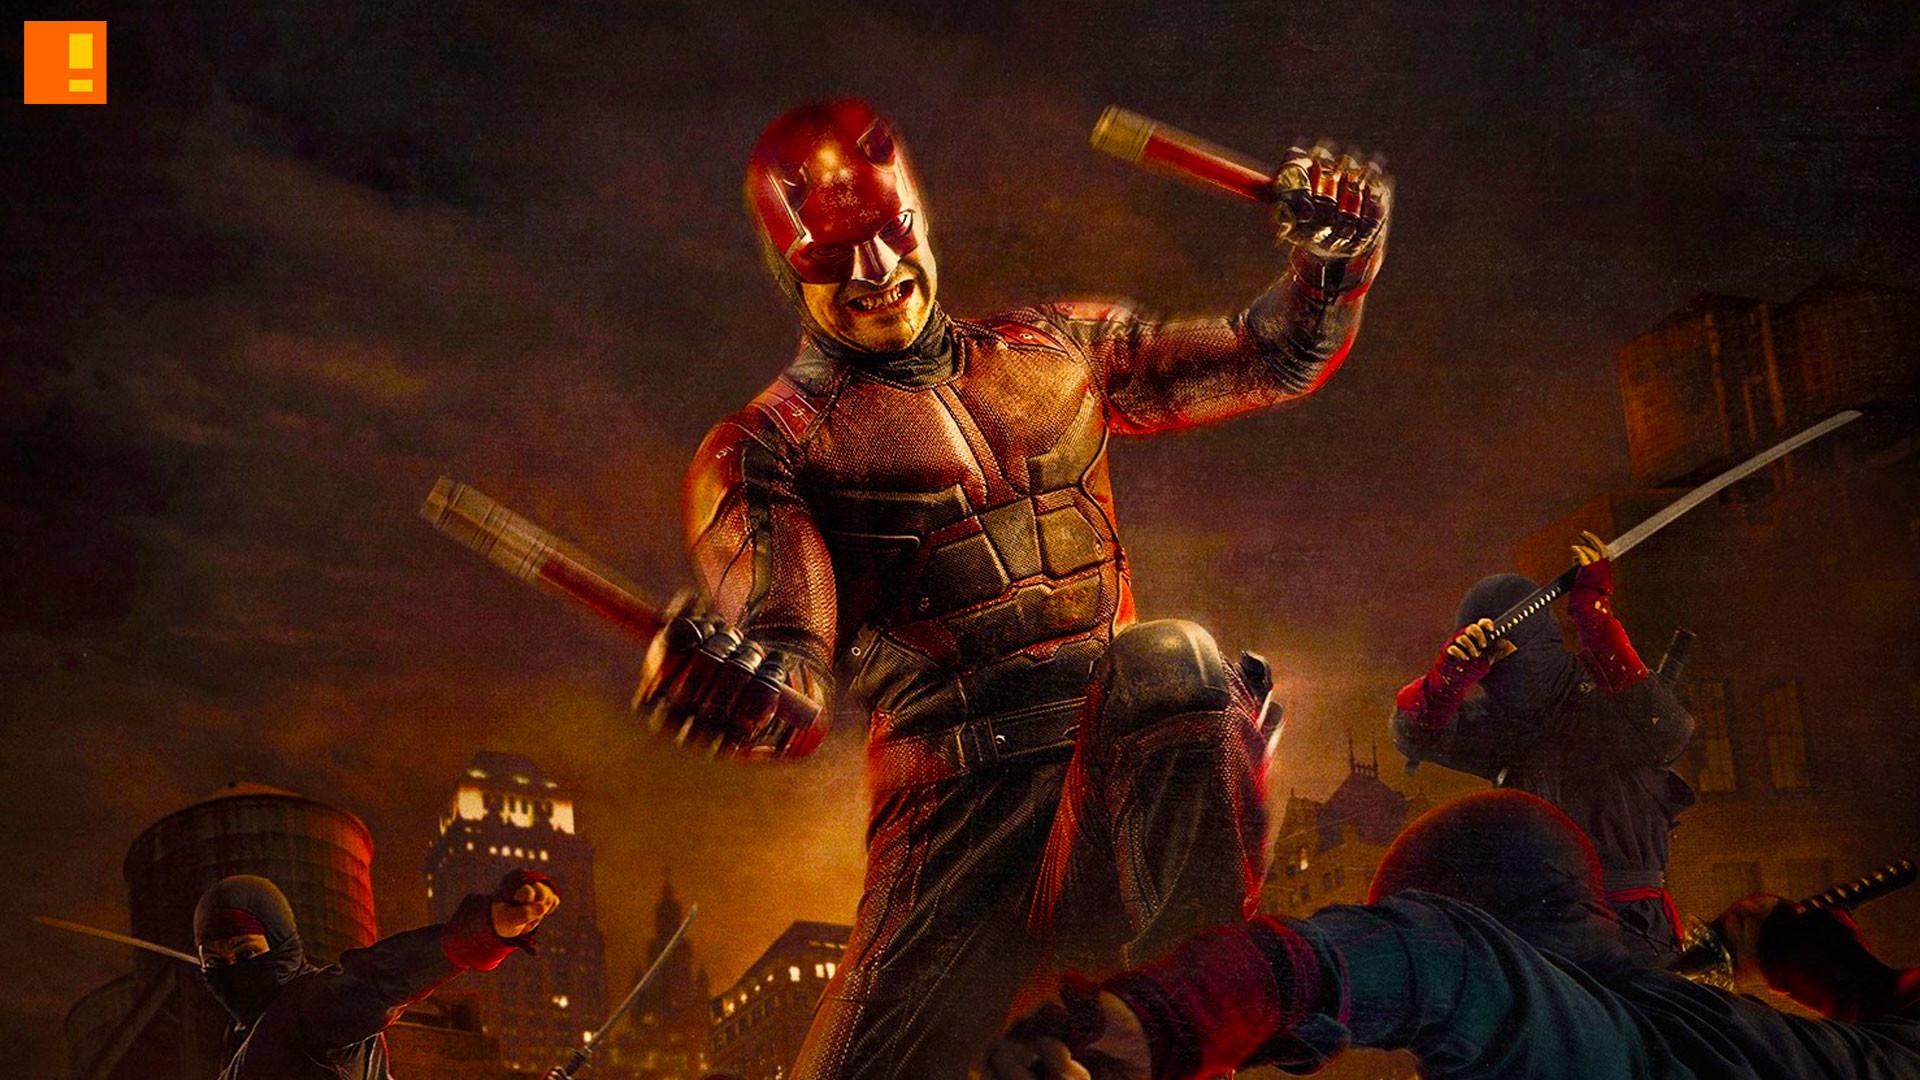 Daredevil Wallpaper – QyGjxZ